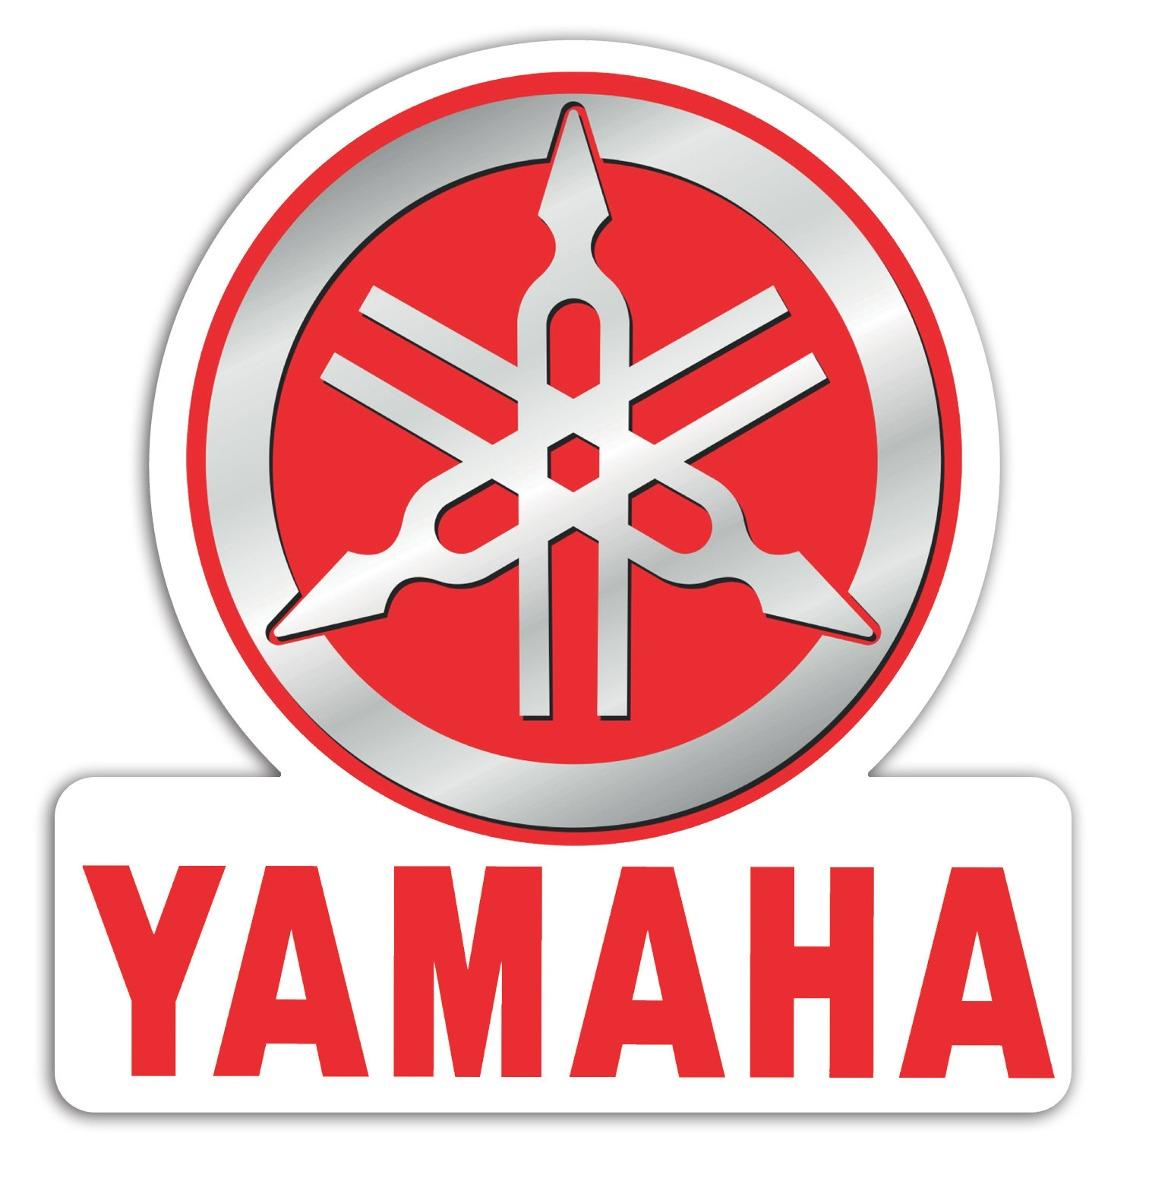 adesivo yamaha moto logo marca vintage retro 0113 r 2 99 em mercado livre. Black Bedroom Furniture Sets. Home Design Ideas